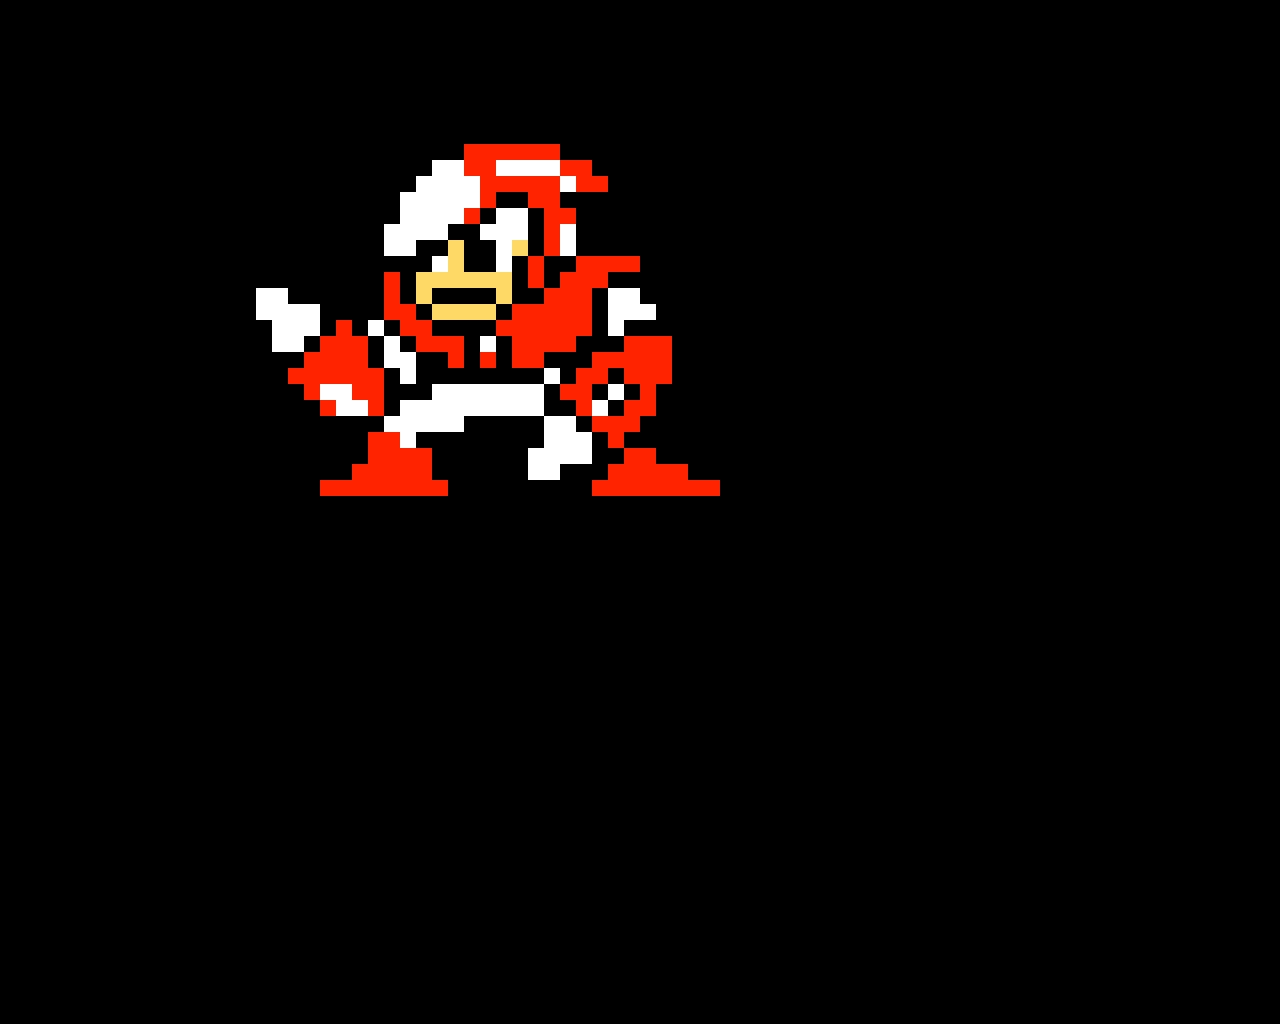 Crash Man (Mega Man 2) (sorry forgot 1 pixel)